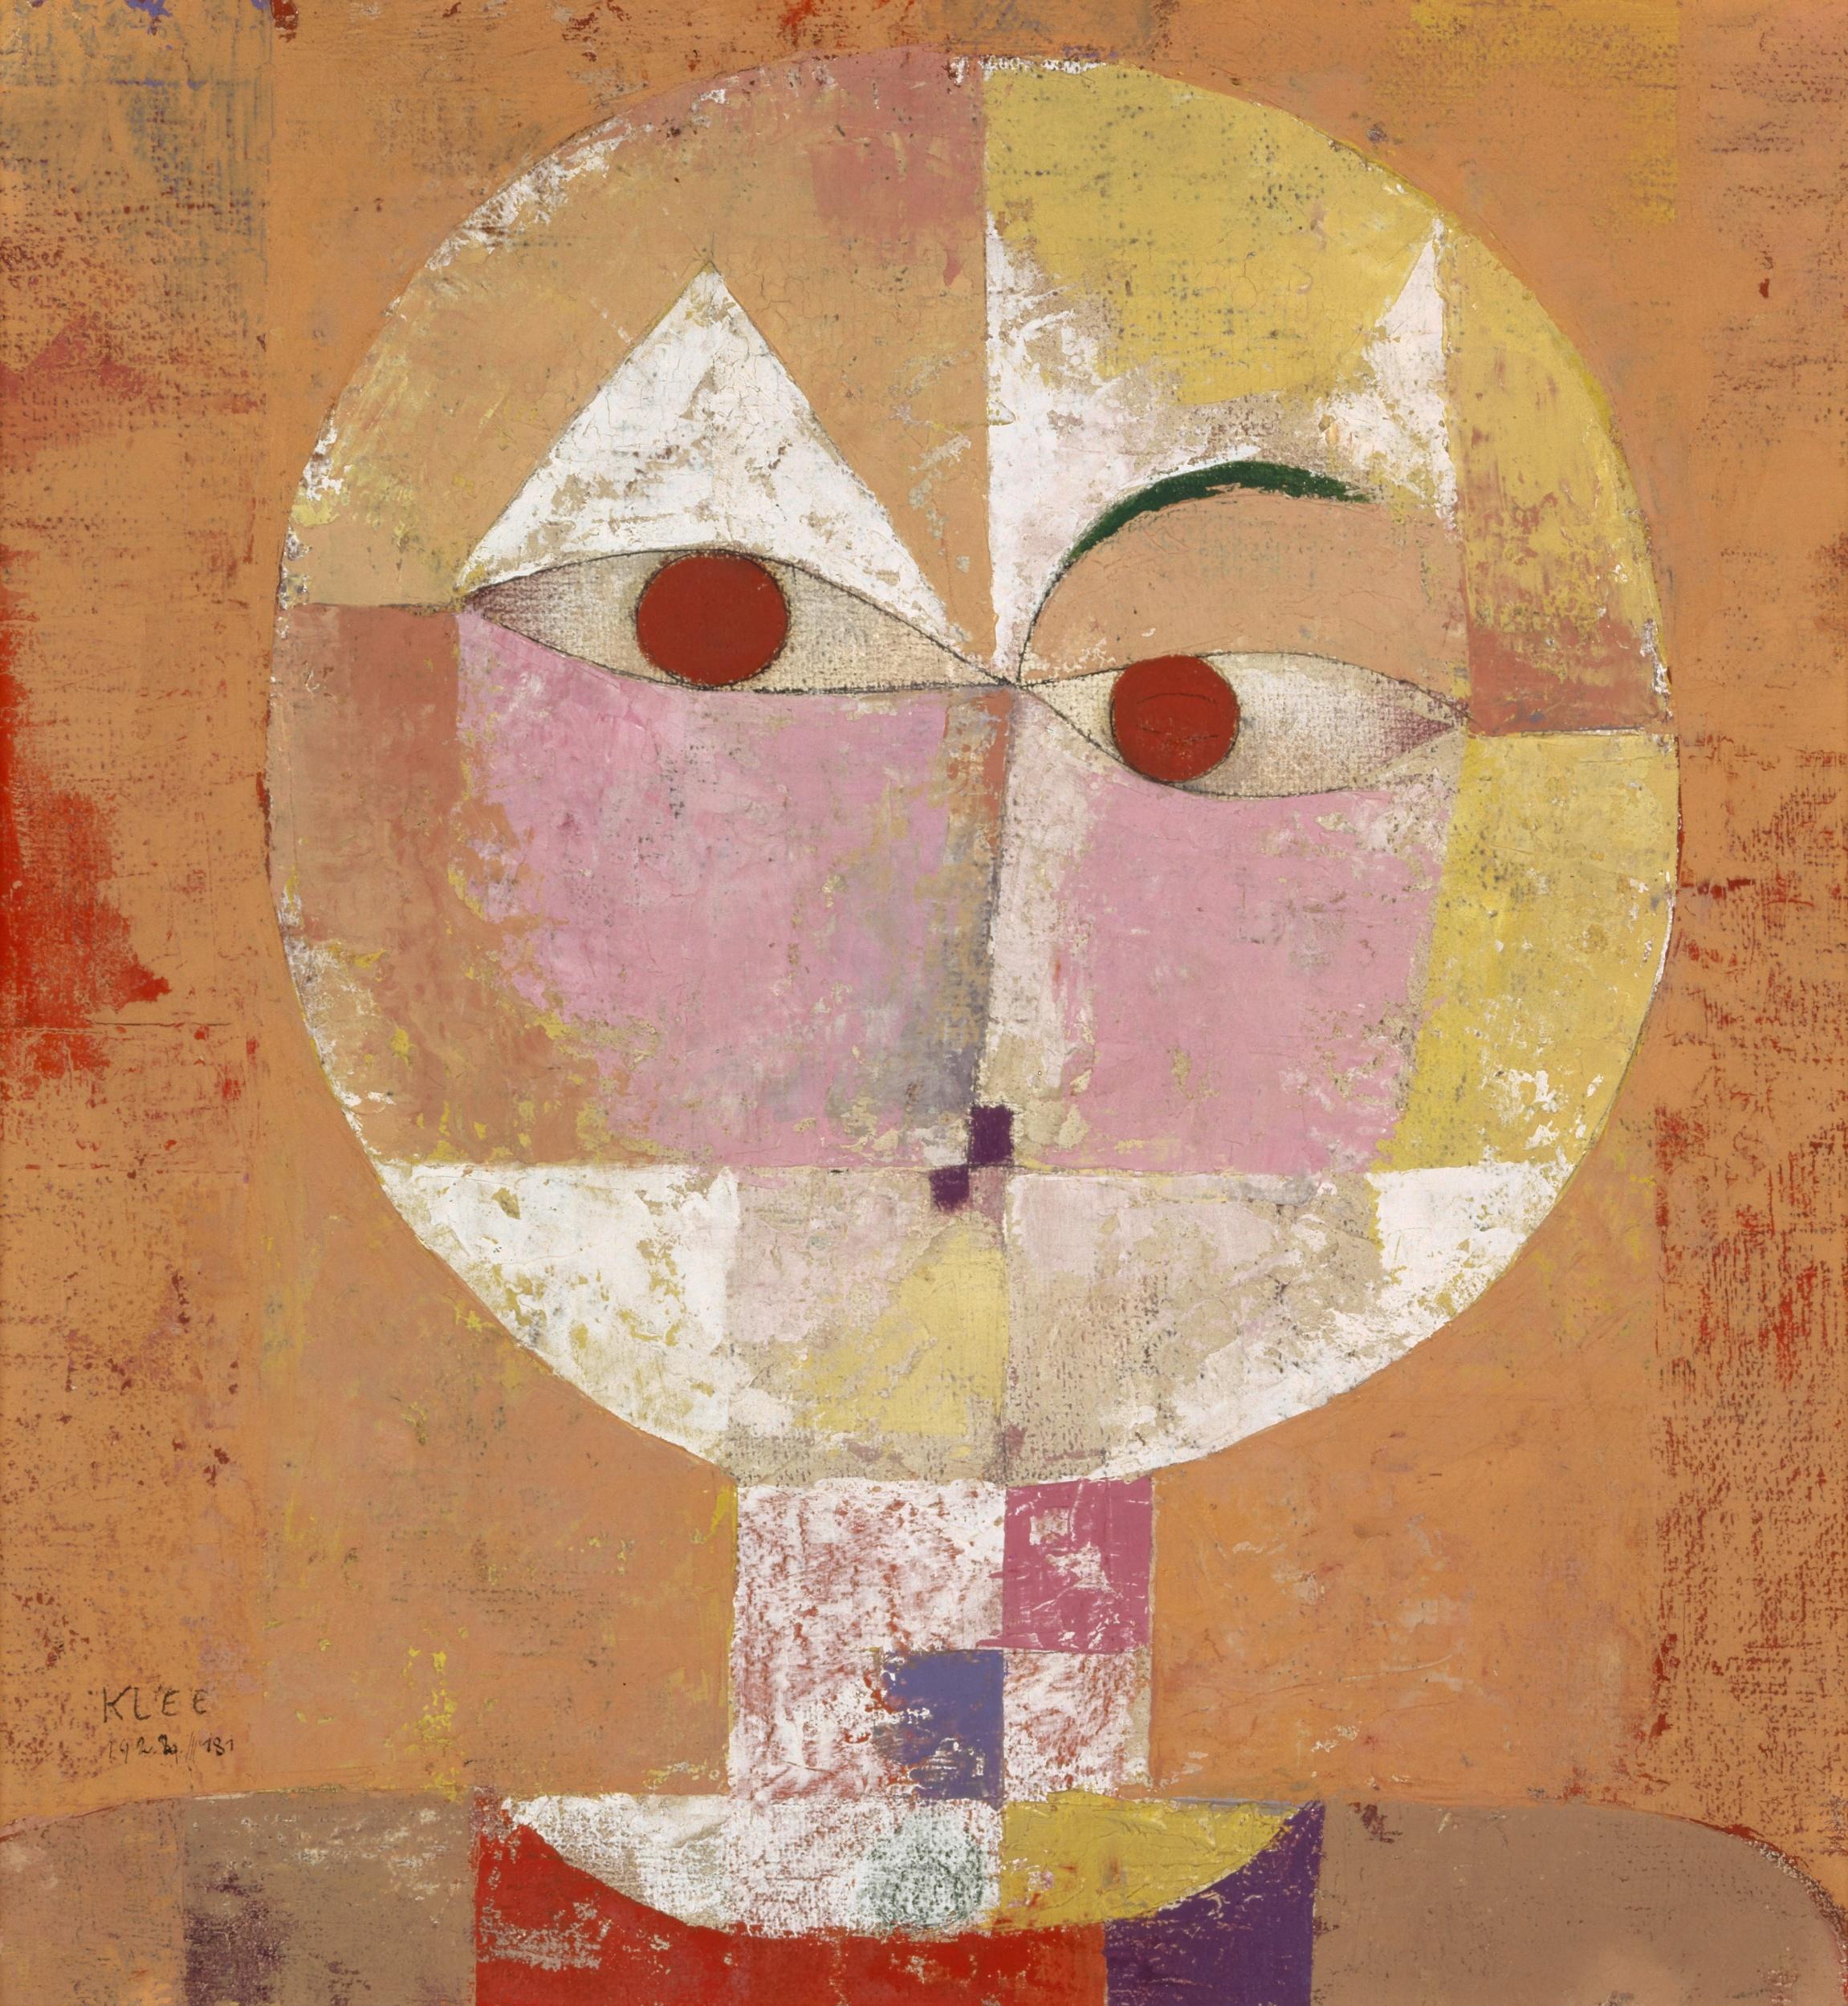 Paul Klee, Senecio, 1922. Kunstmuseum Basel